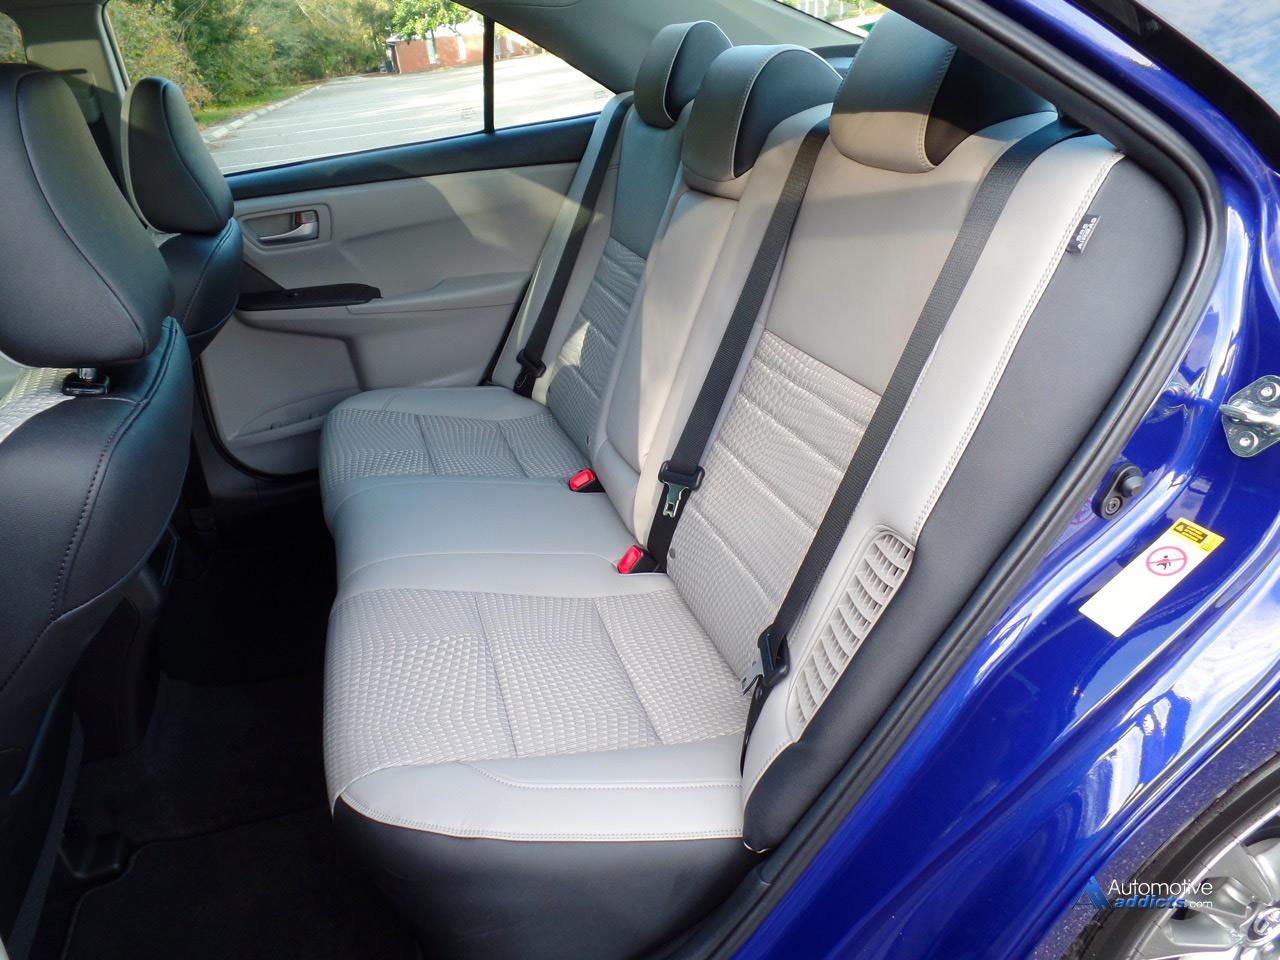 2015 Toyota Camry Se Hybrid Rear Seats